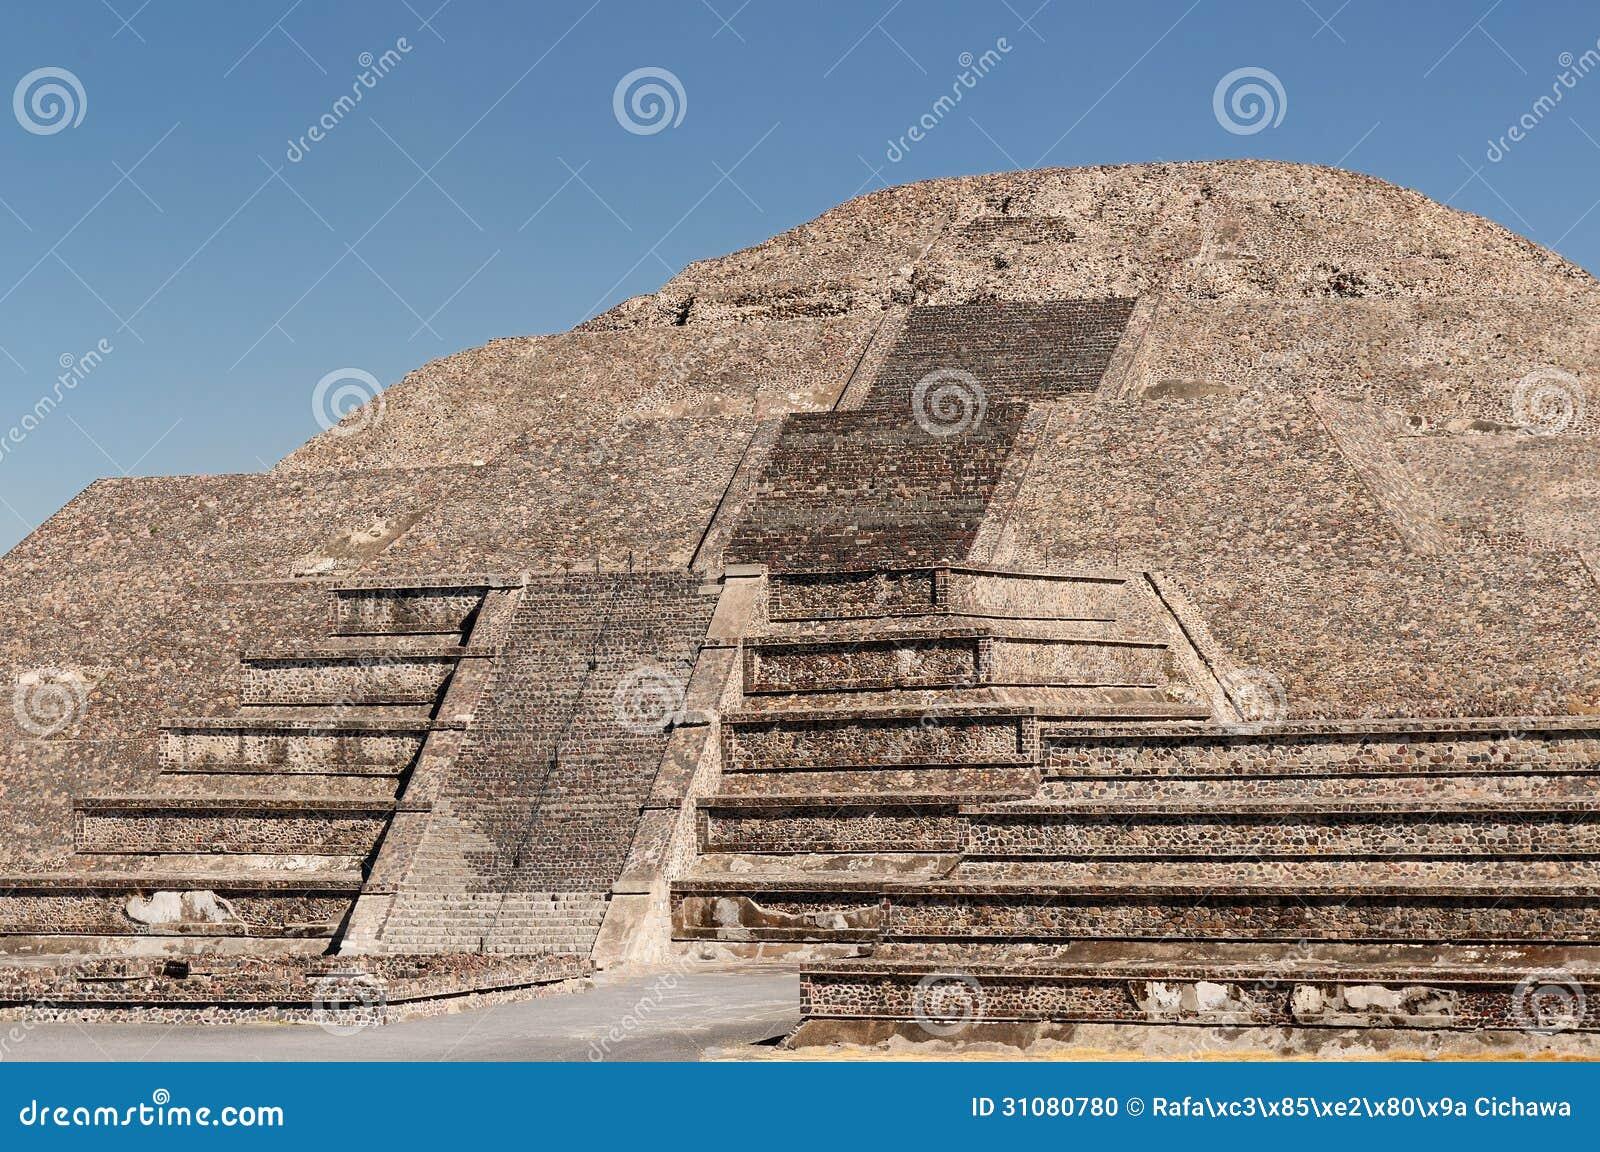 Aztec Empire for Kids Art  Ducksters Education Site